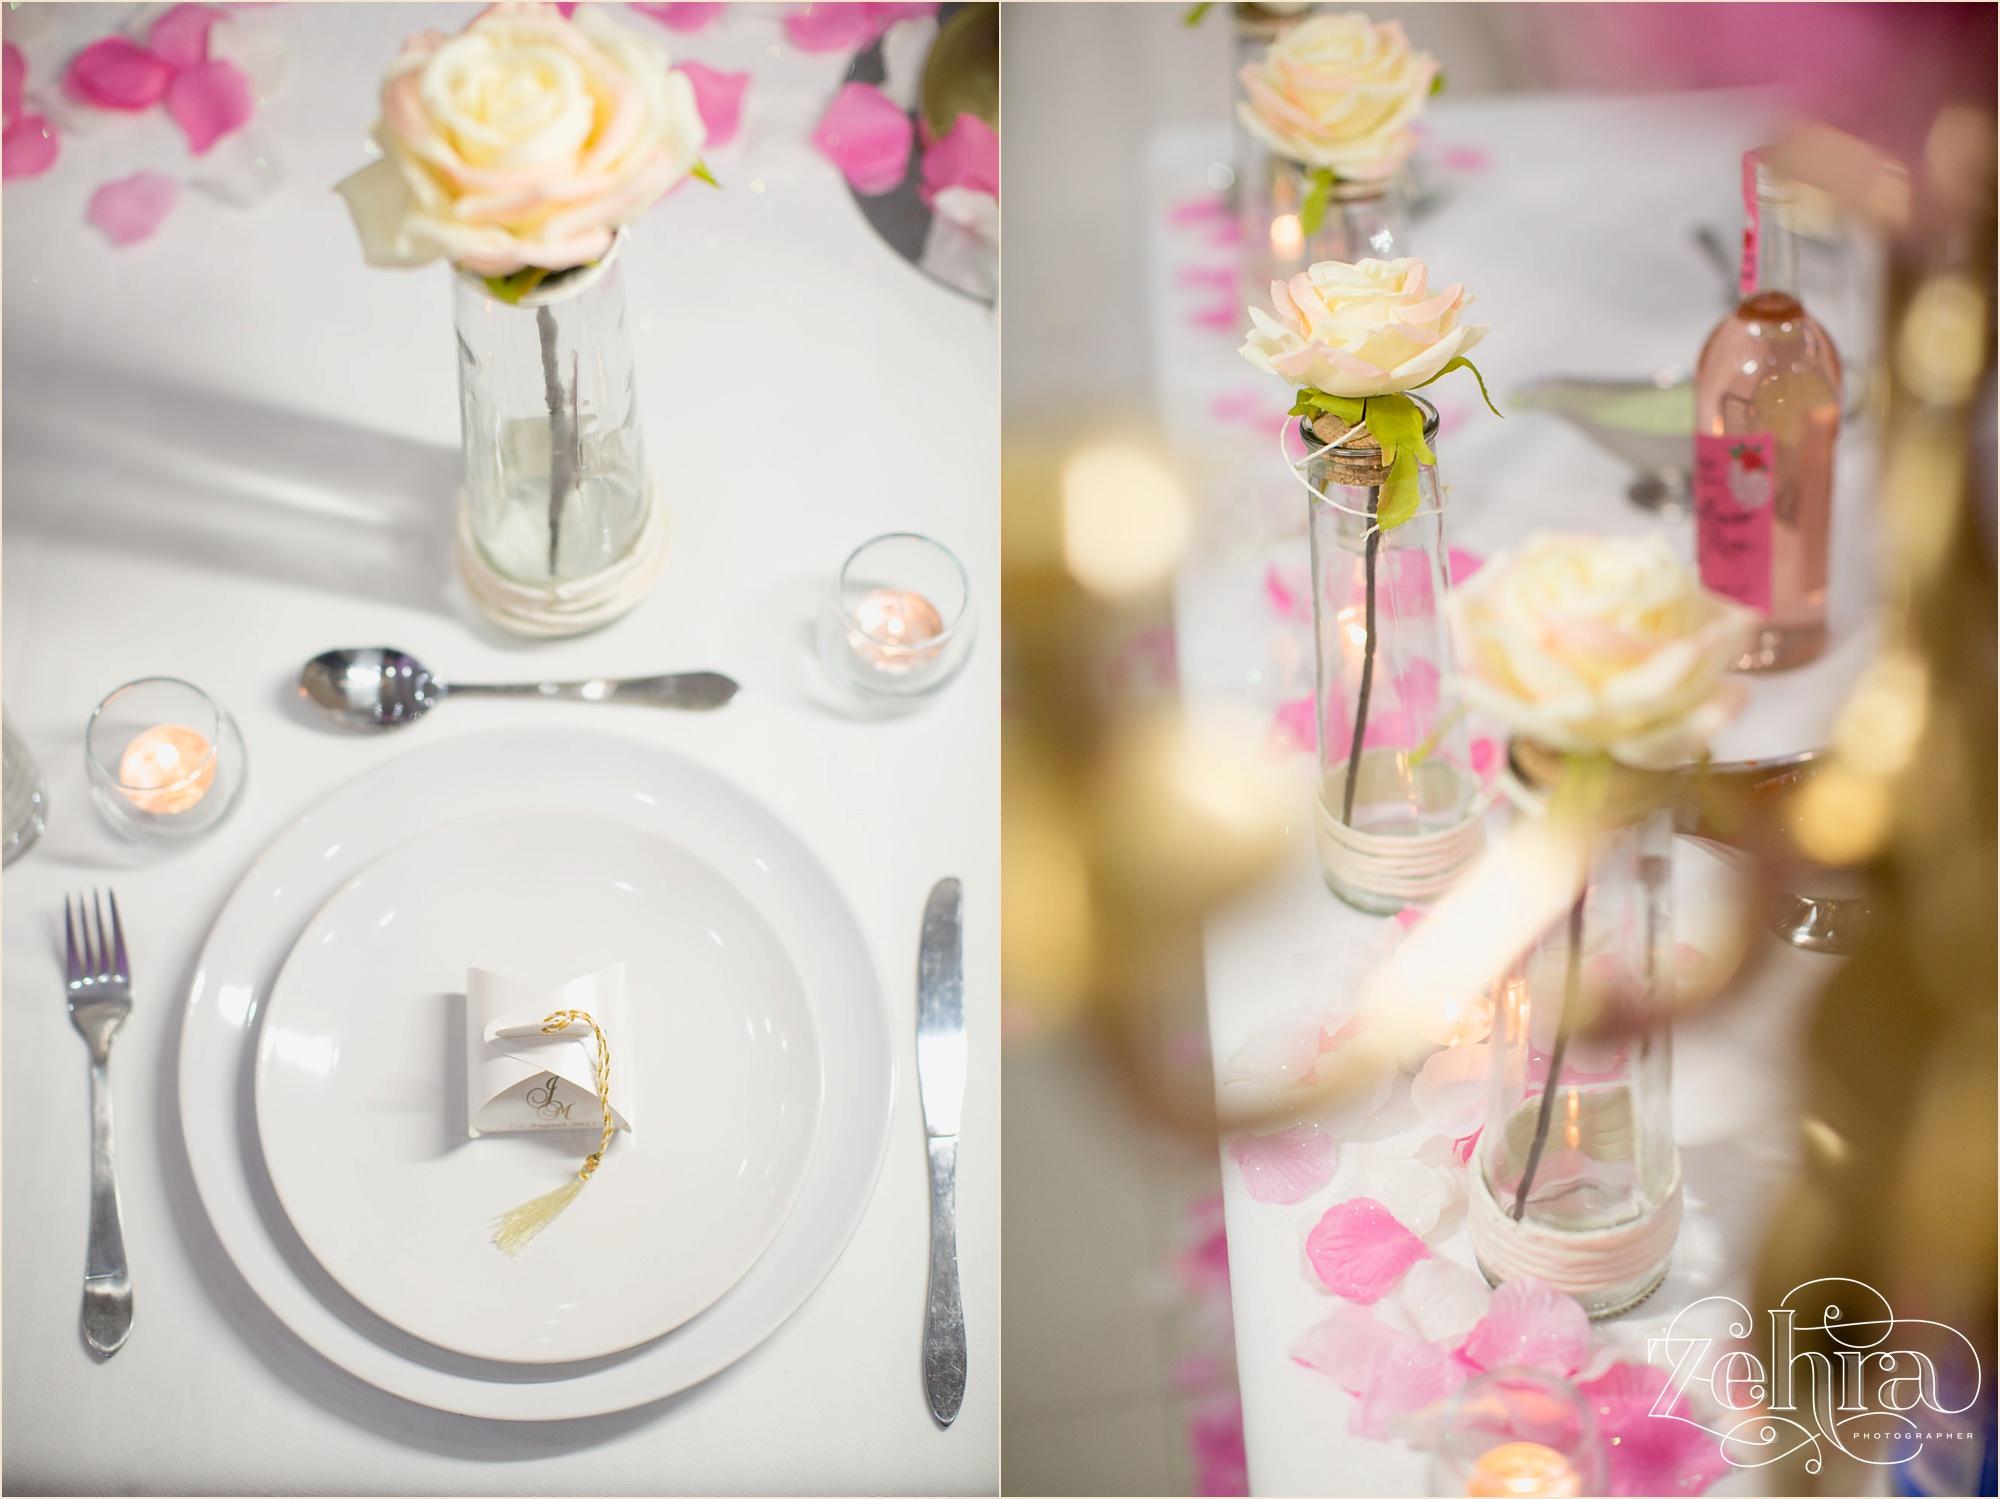 jasira manchester wedding photographer_0032.jpg